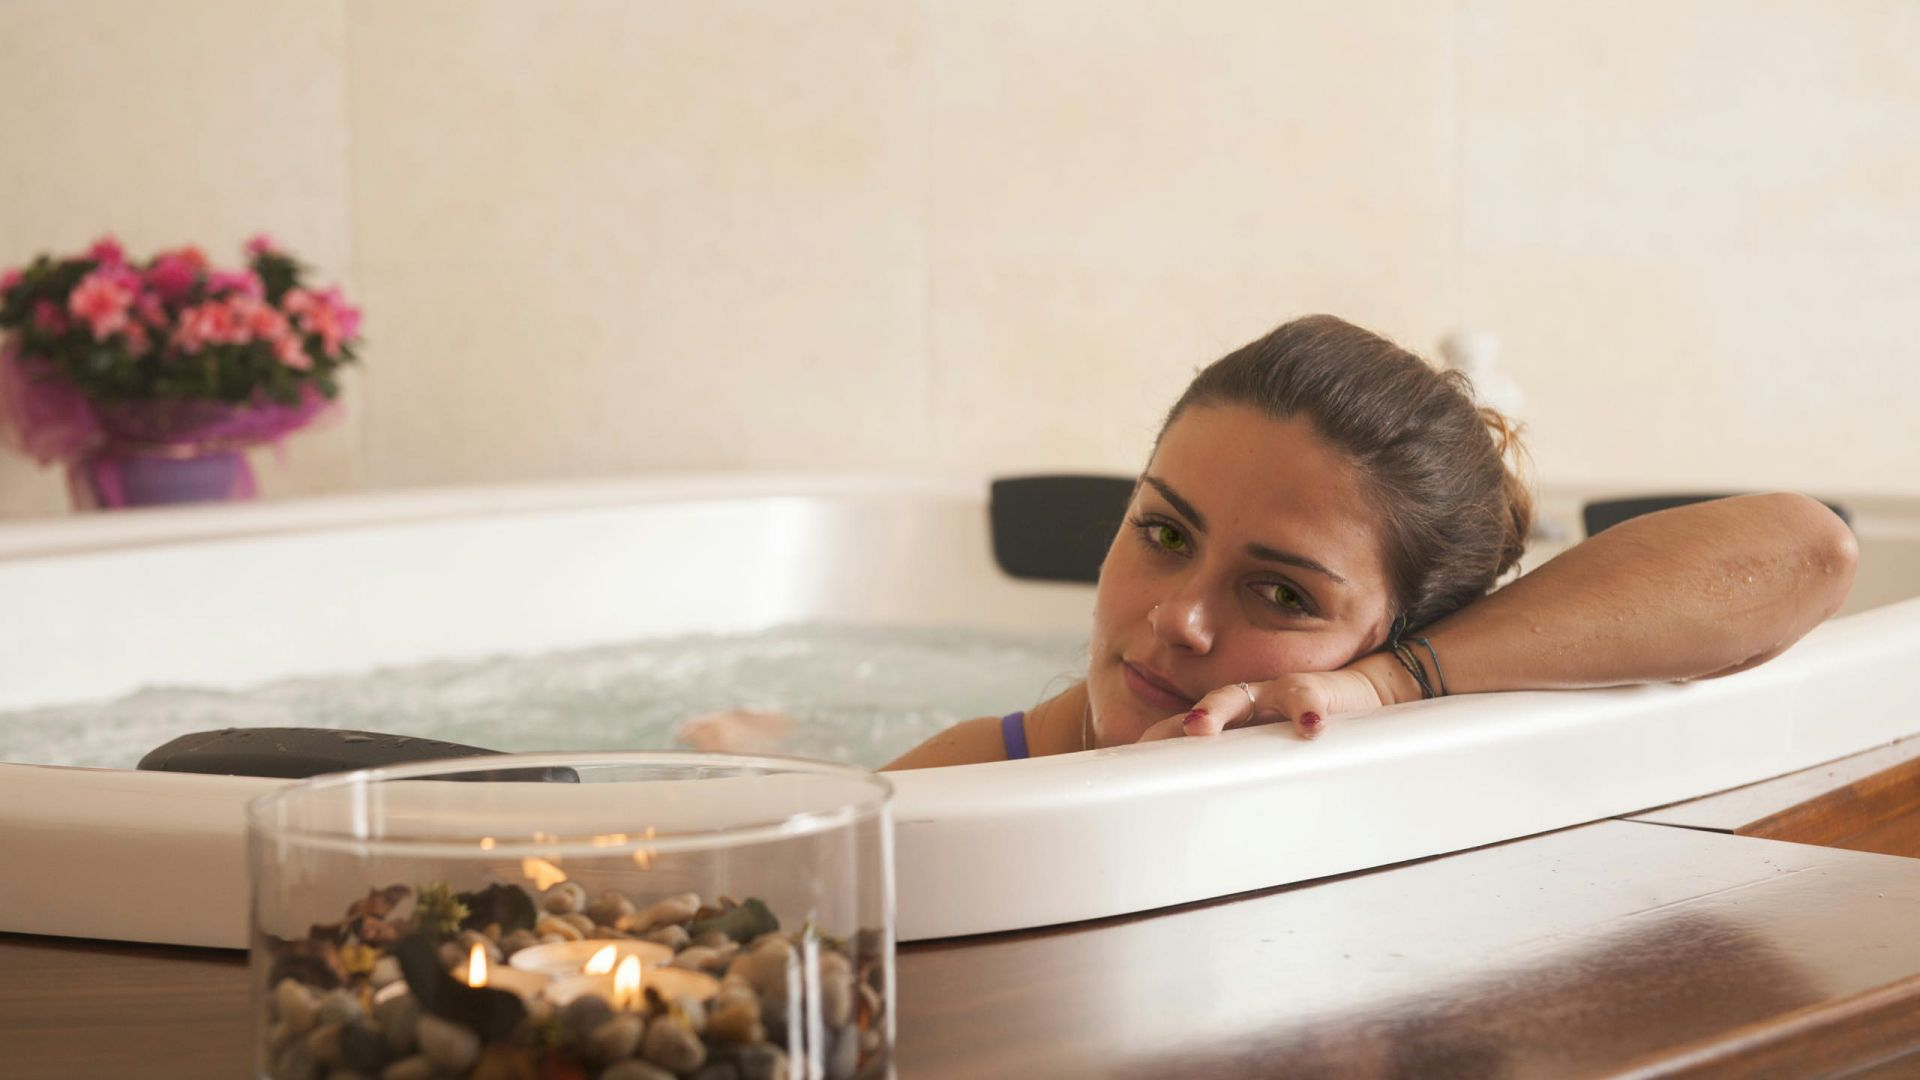 oc-hotel-rome-spa-005